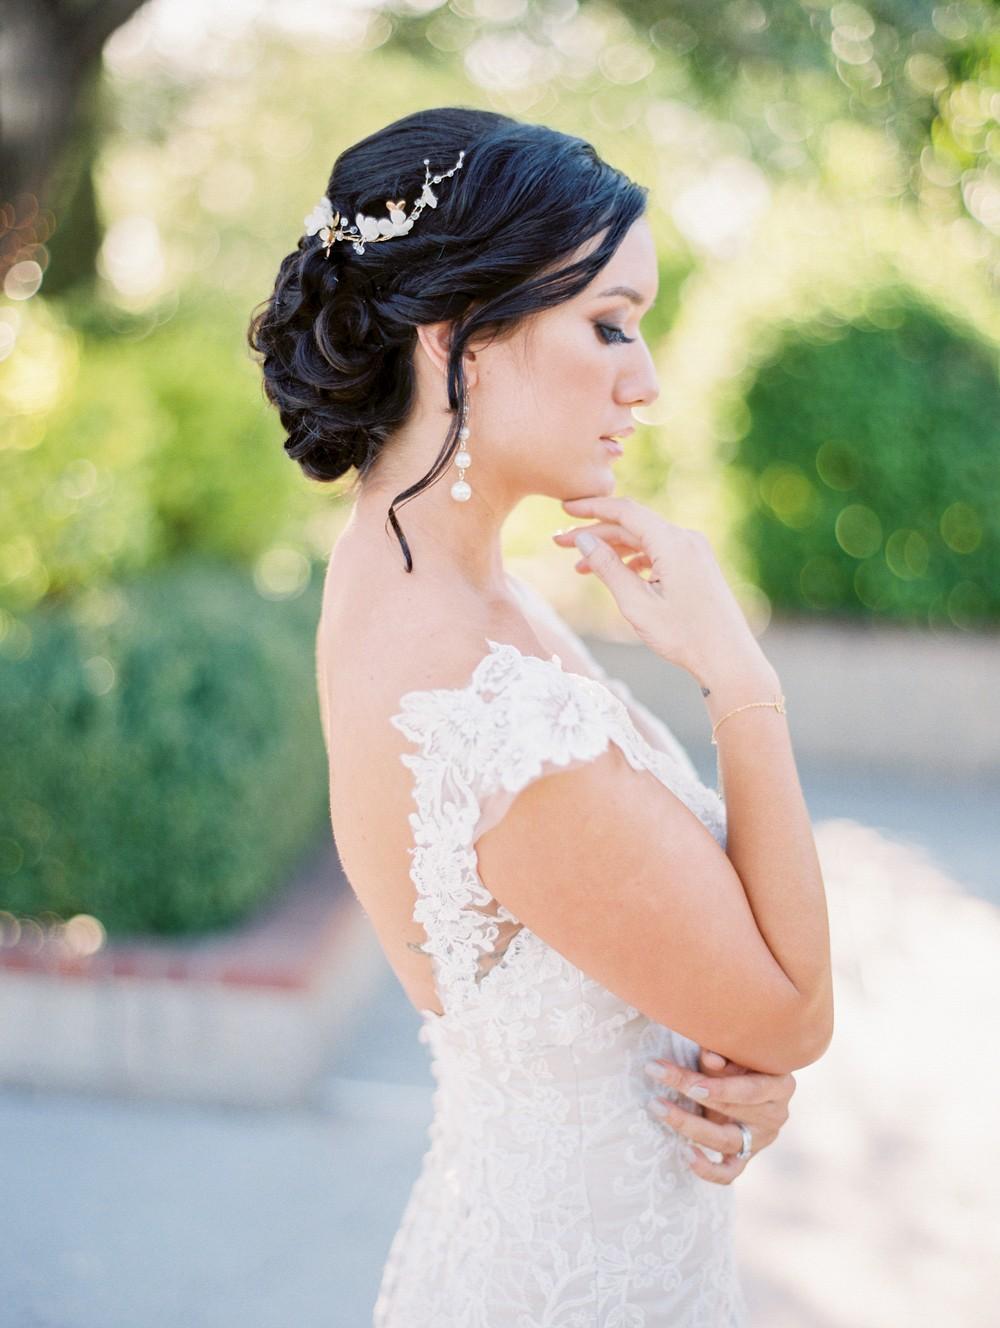 Krystina and John's Elegant Arizona Wedding